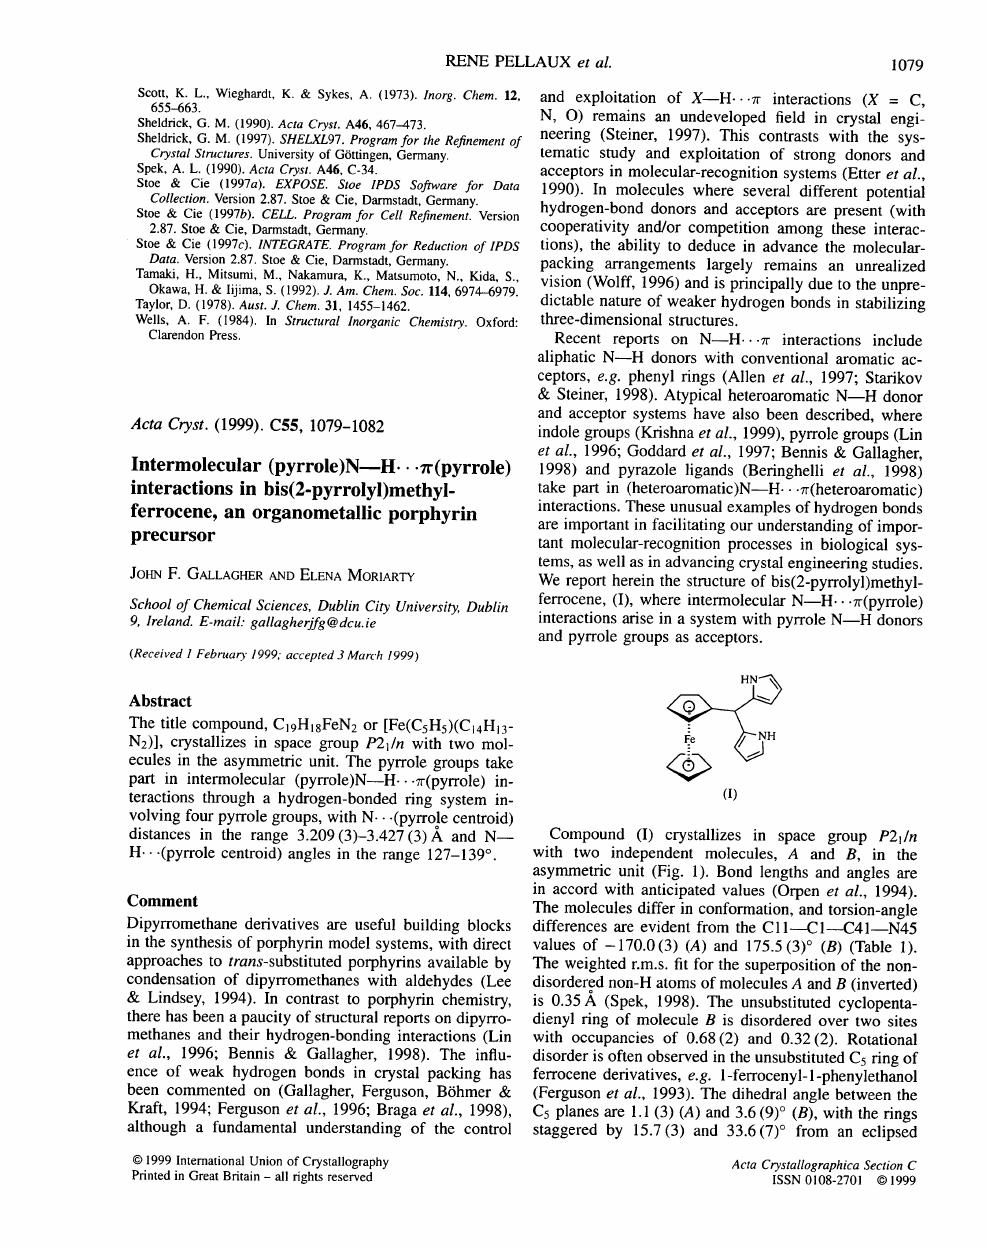 Intermolecular (pyrrole)N—H   π(pyrrole) interactions in bis